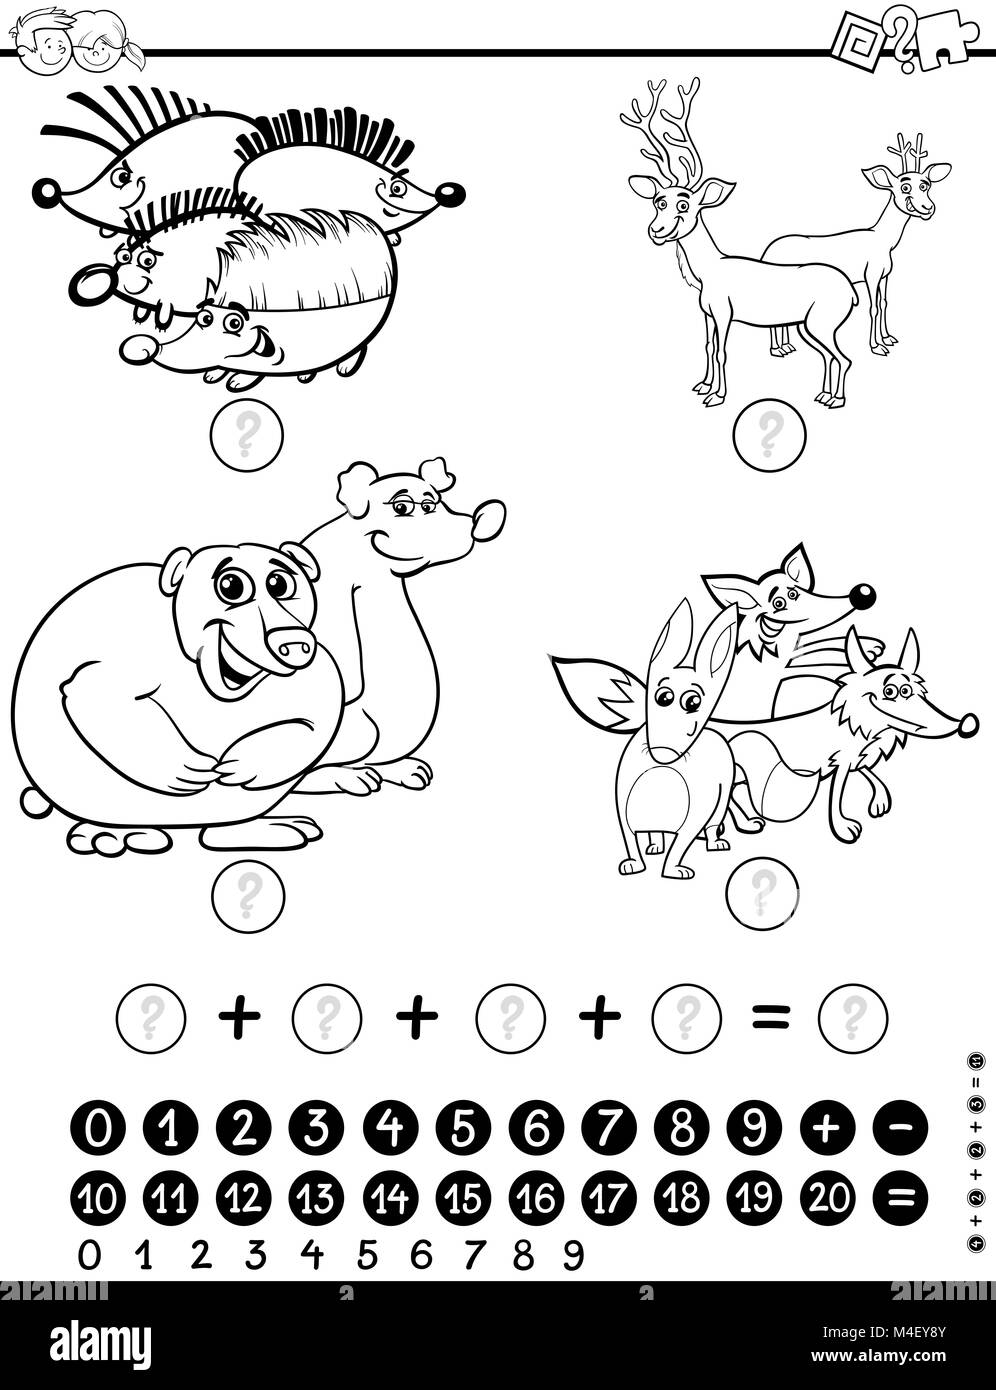 Mathematics Funny Drawing Maths Imágenes De Stock & Mathematics ...